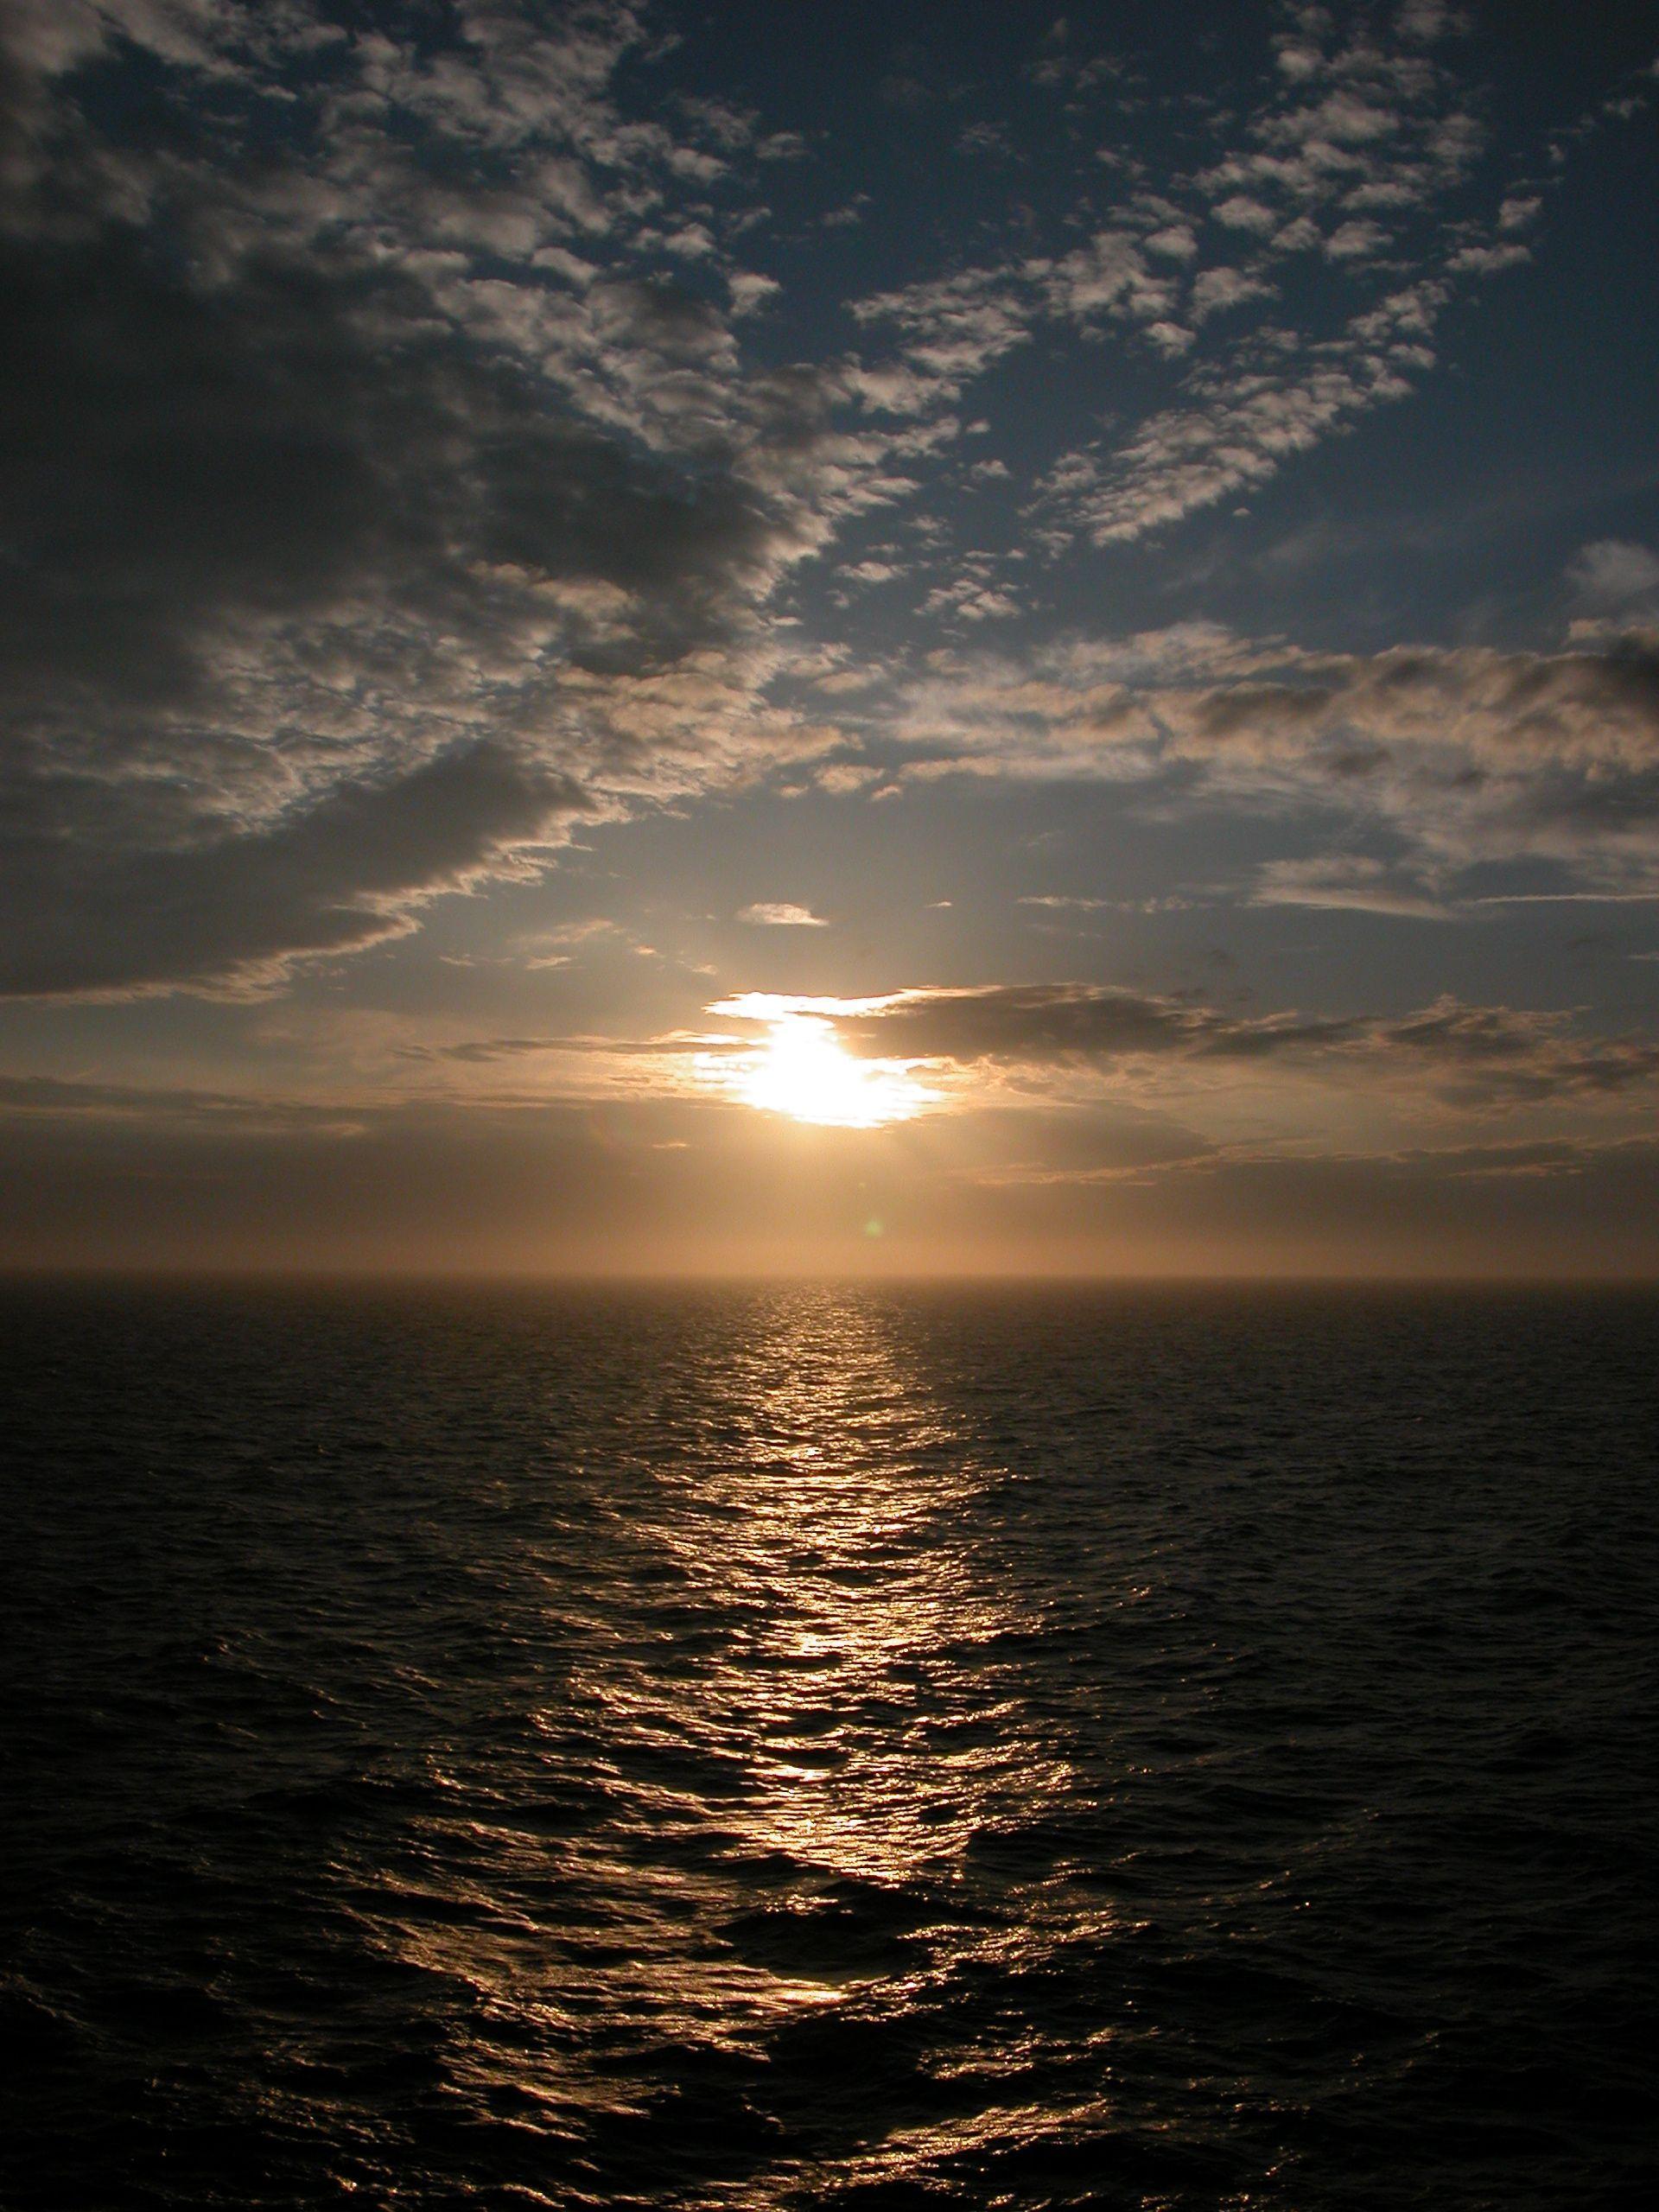 Landscapes Seascapes Elements Sunrise Nature Clouds Sunset Water Ocean Dusk Dawn Sky Sea Sunnature Landscapes Ocean Landscape Landscape Seascape